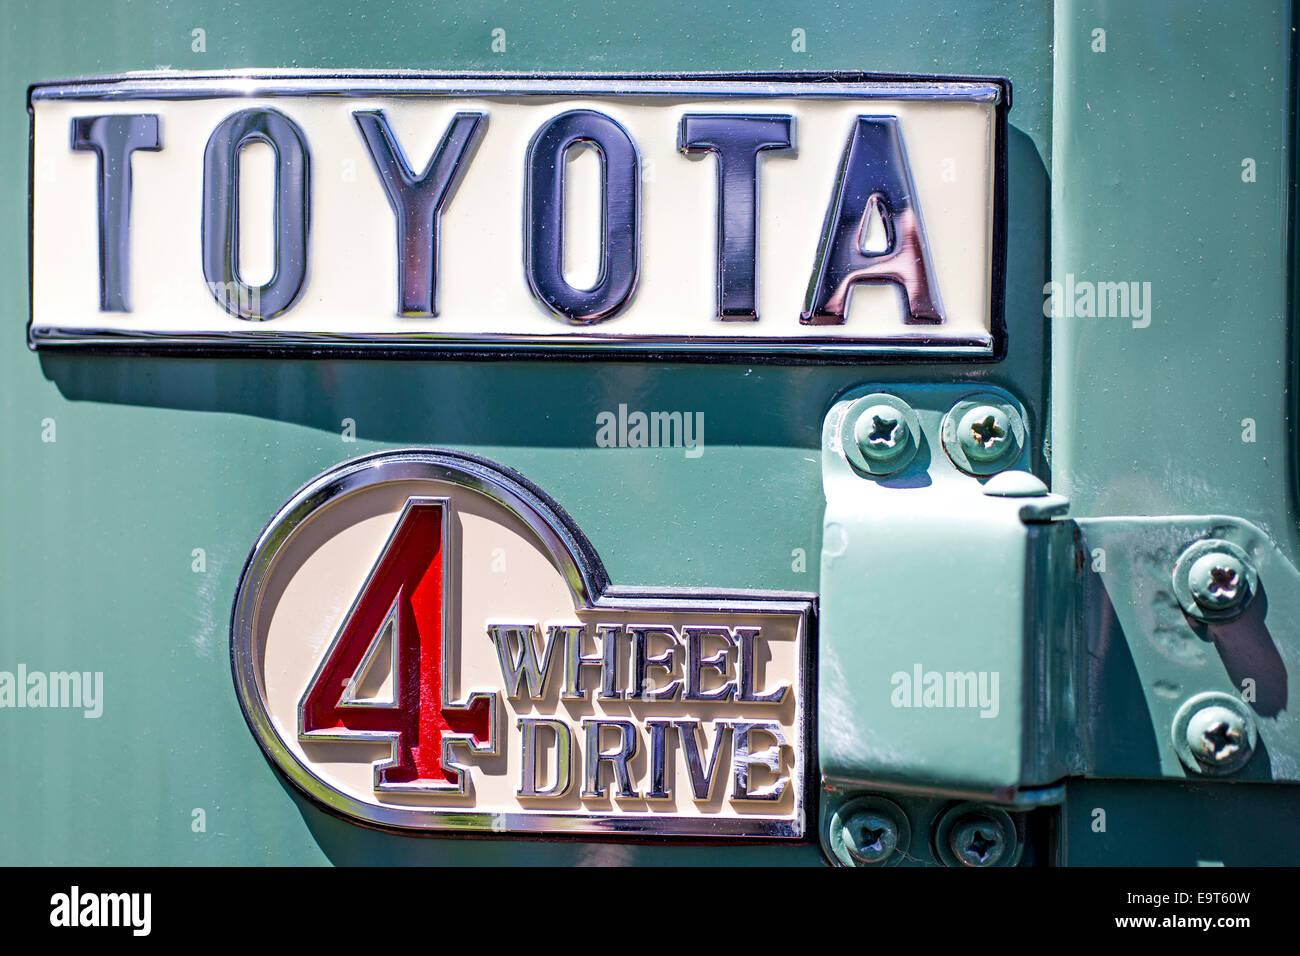 Toyota 4 wheel drive - Stock Image